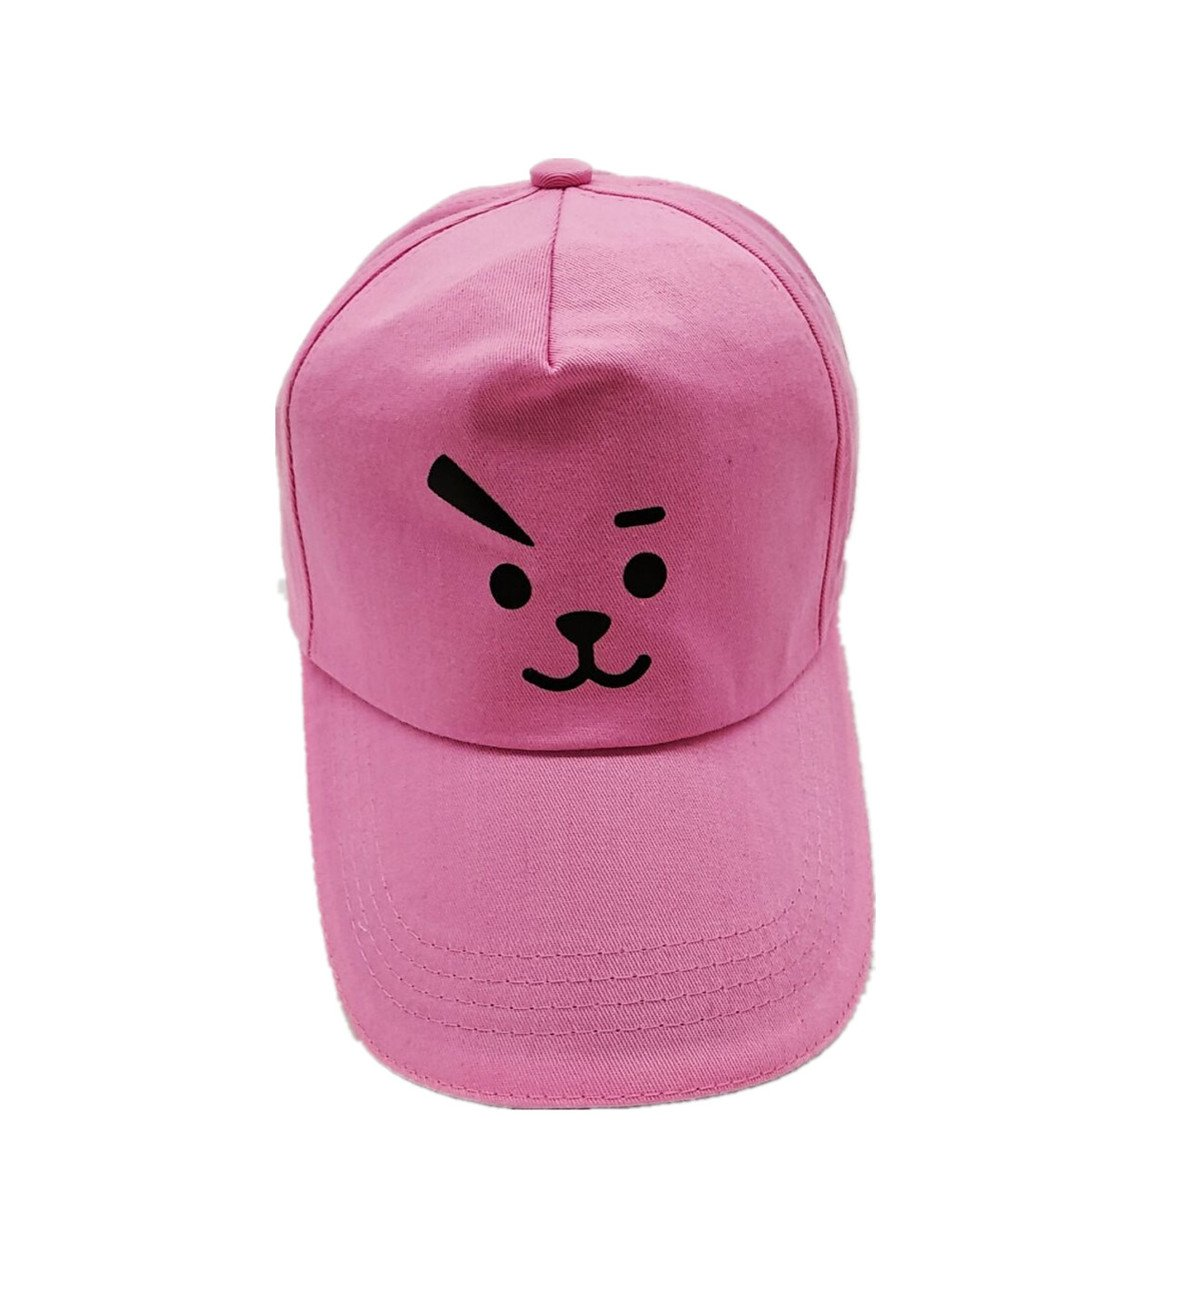 BTS Bangtan Boys Love Yourself Cute Cap Fshion Hat Jung Kook V Suga Jin Jimin J-Hope RM (Cooky)